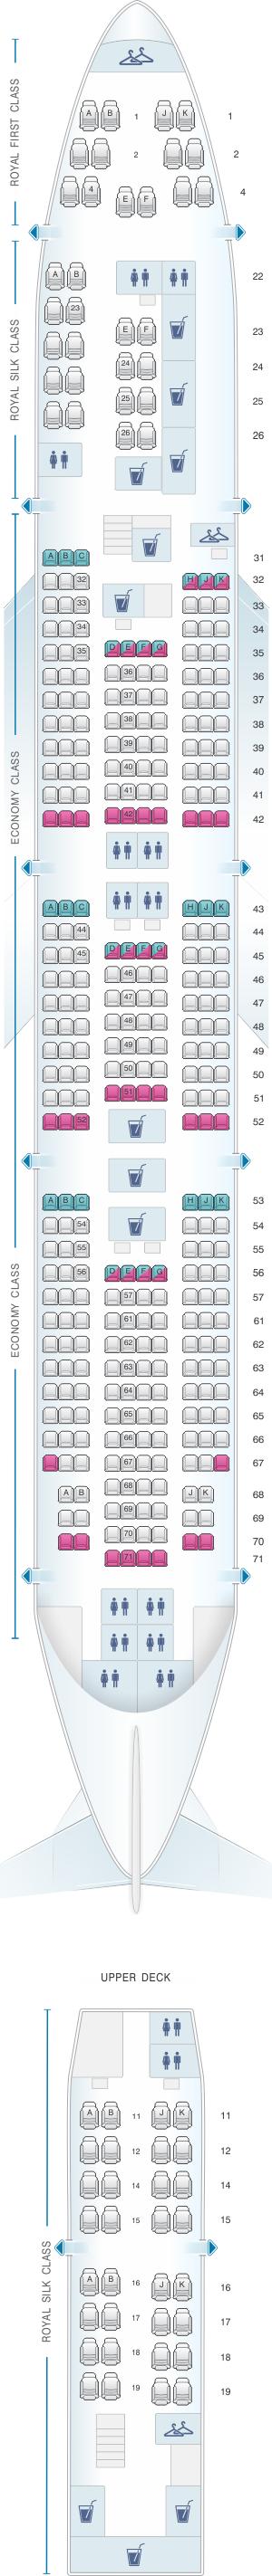 Seat map for Thai Airways International Boeing B747 400 (744)